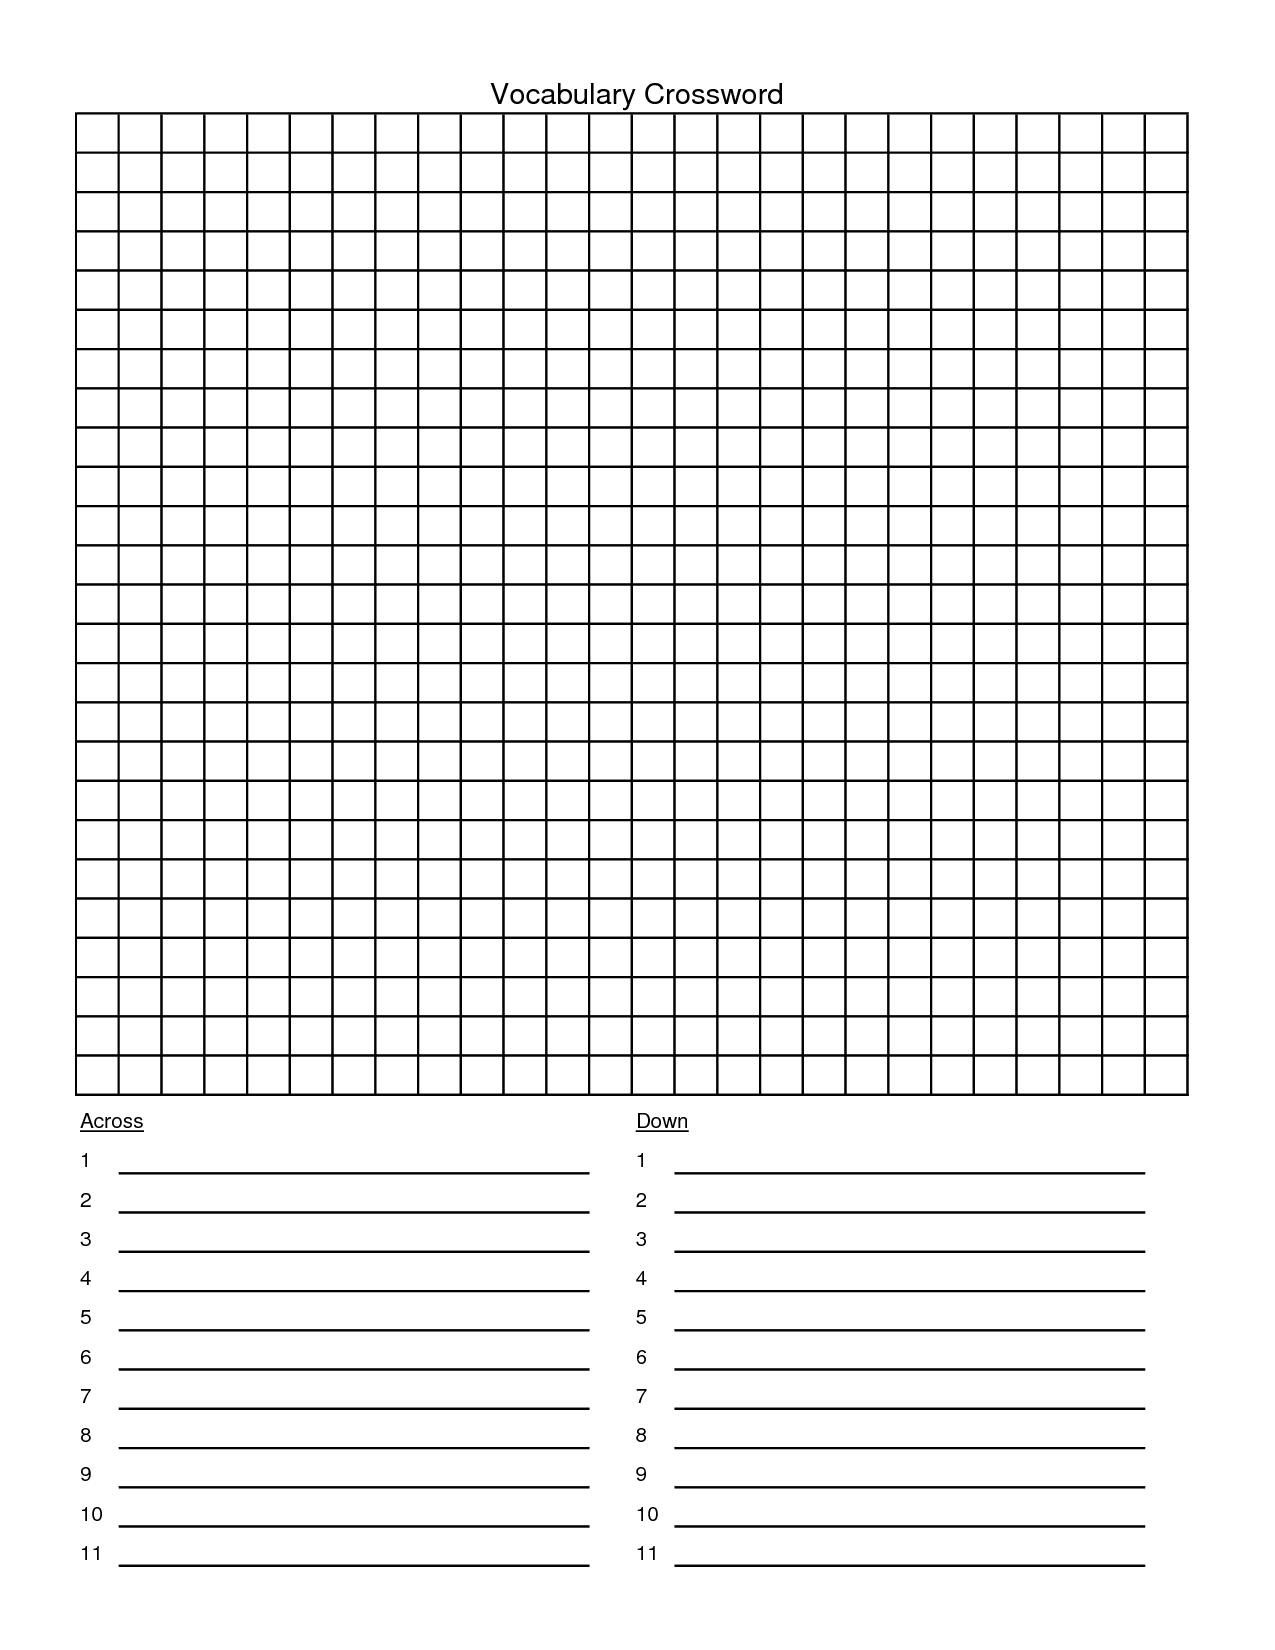 Blank Crossword Template. Blank Crossword Puzzle Clues Template - Printable Blank Crossword Puzzle Grid